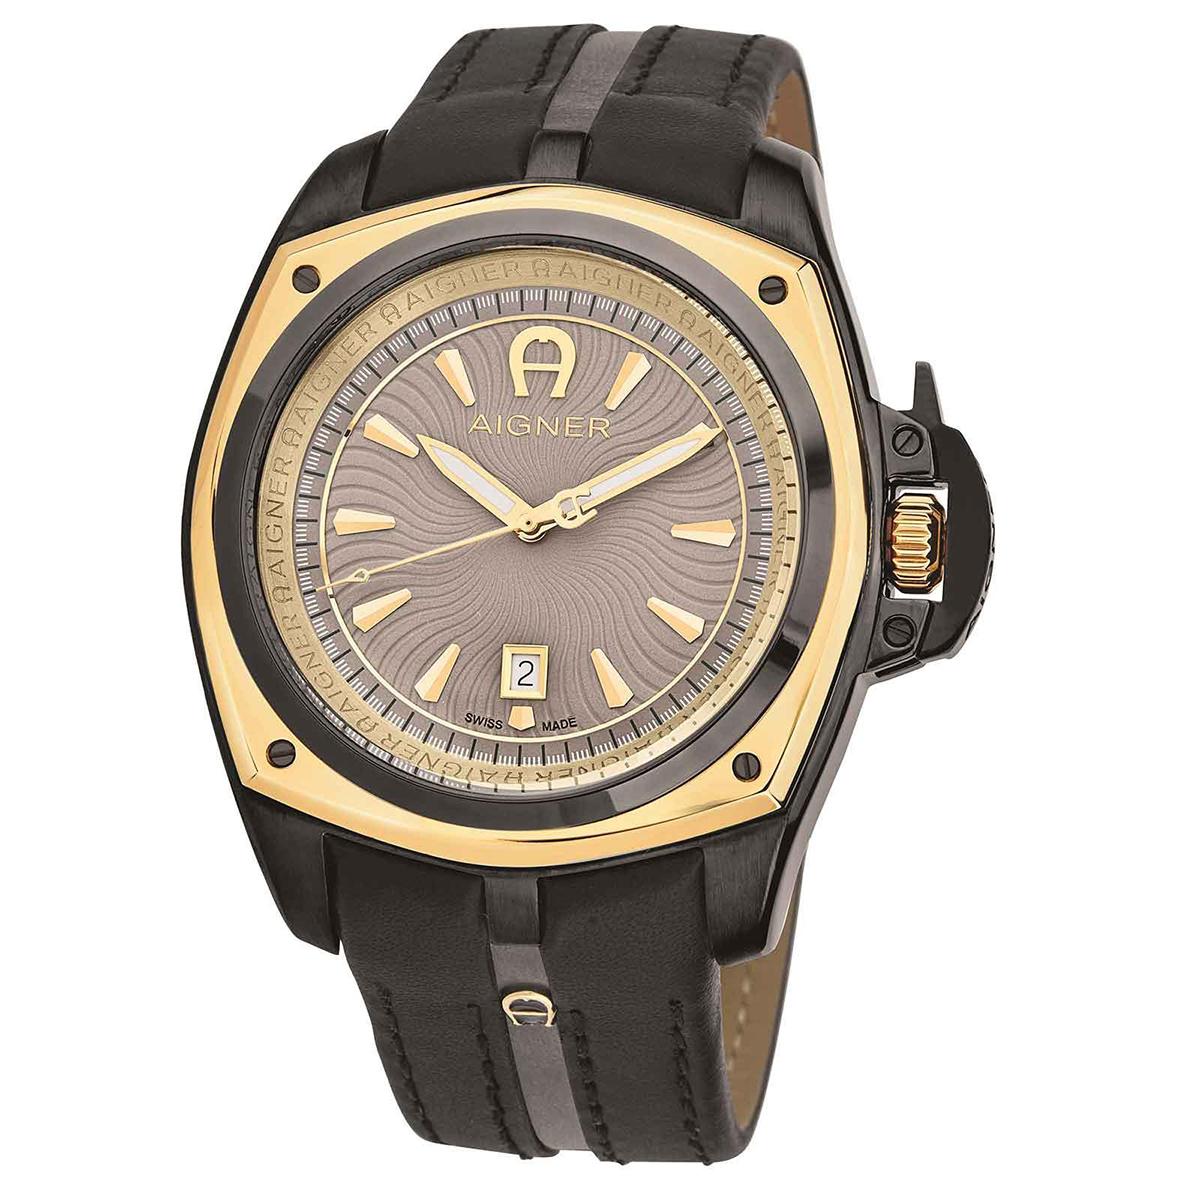 ساعت  اگنر مدل A18124